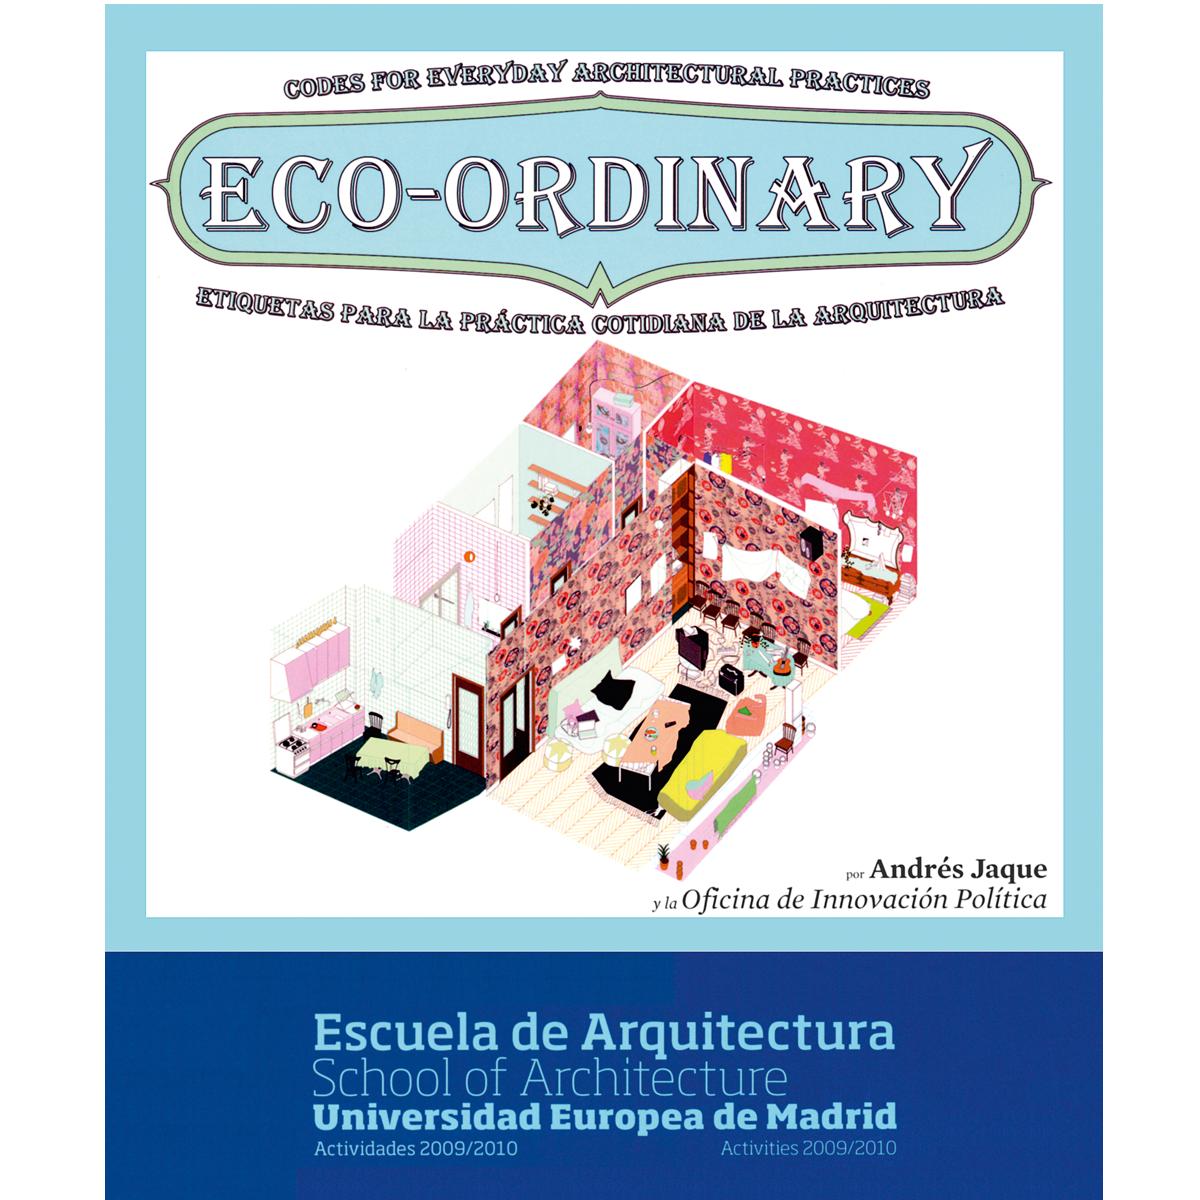 Eco-ordinary